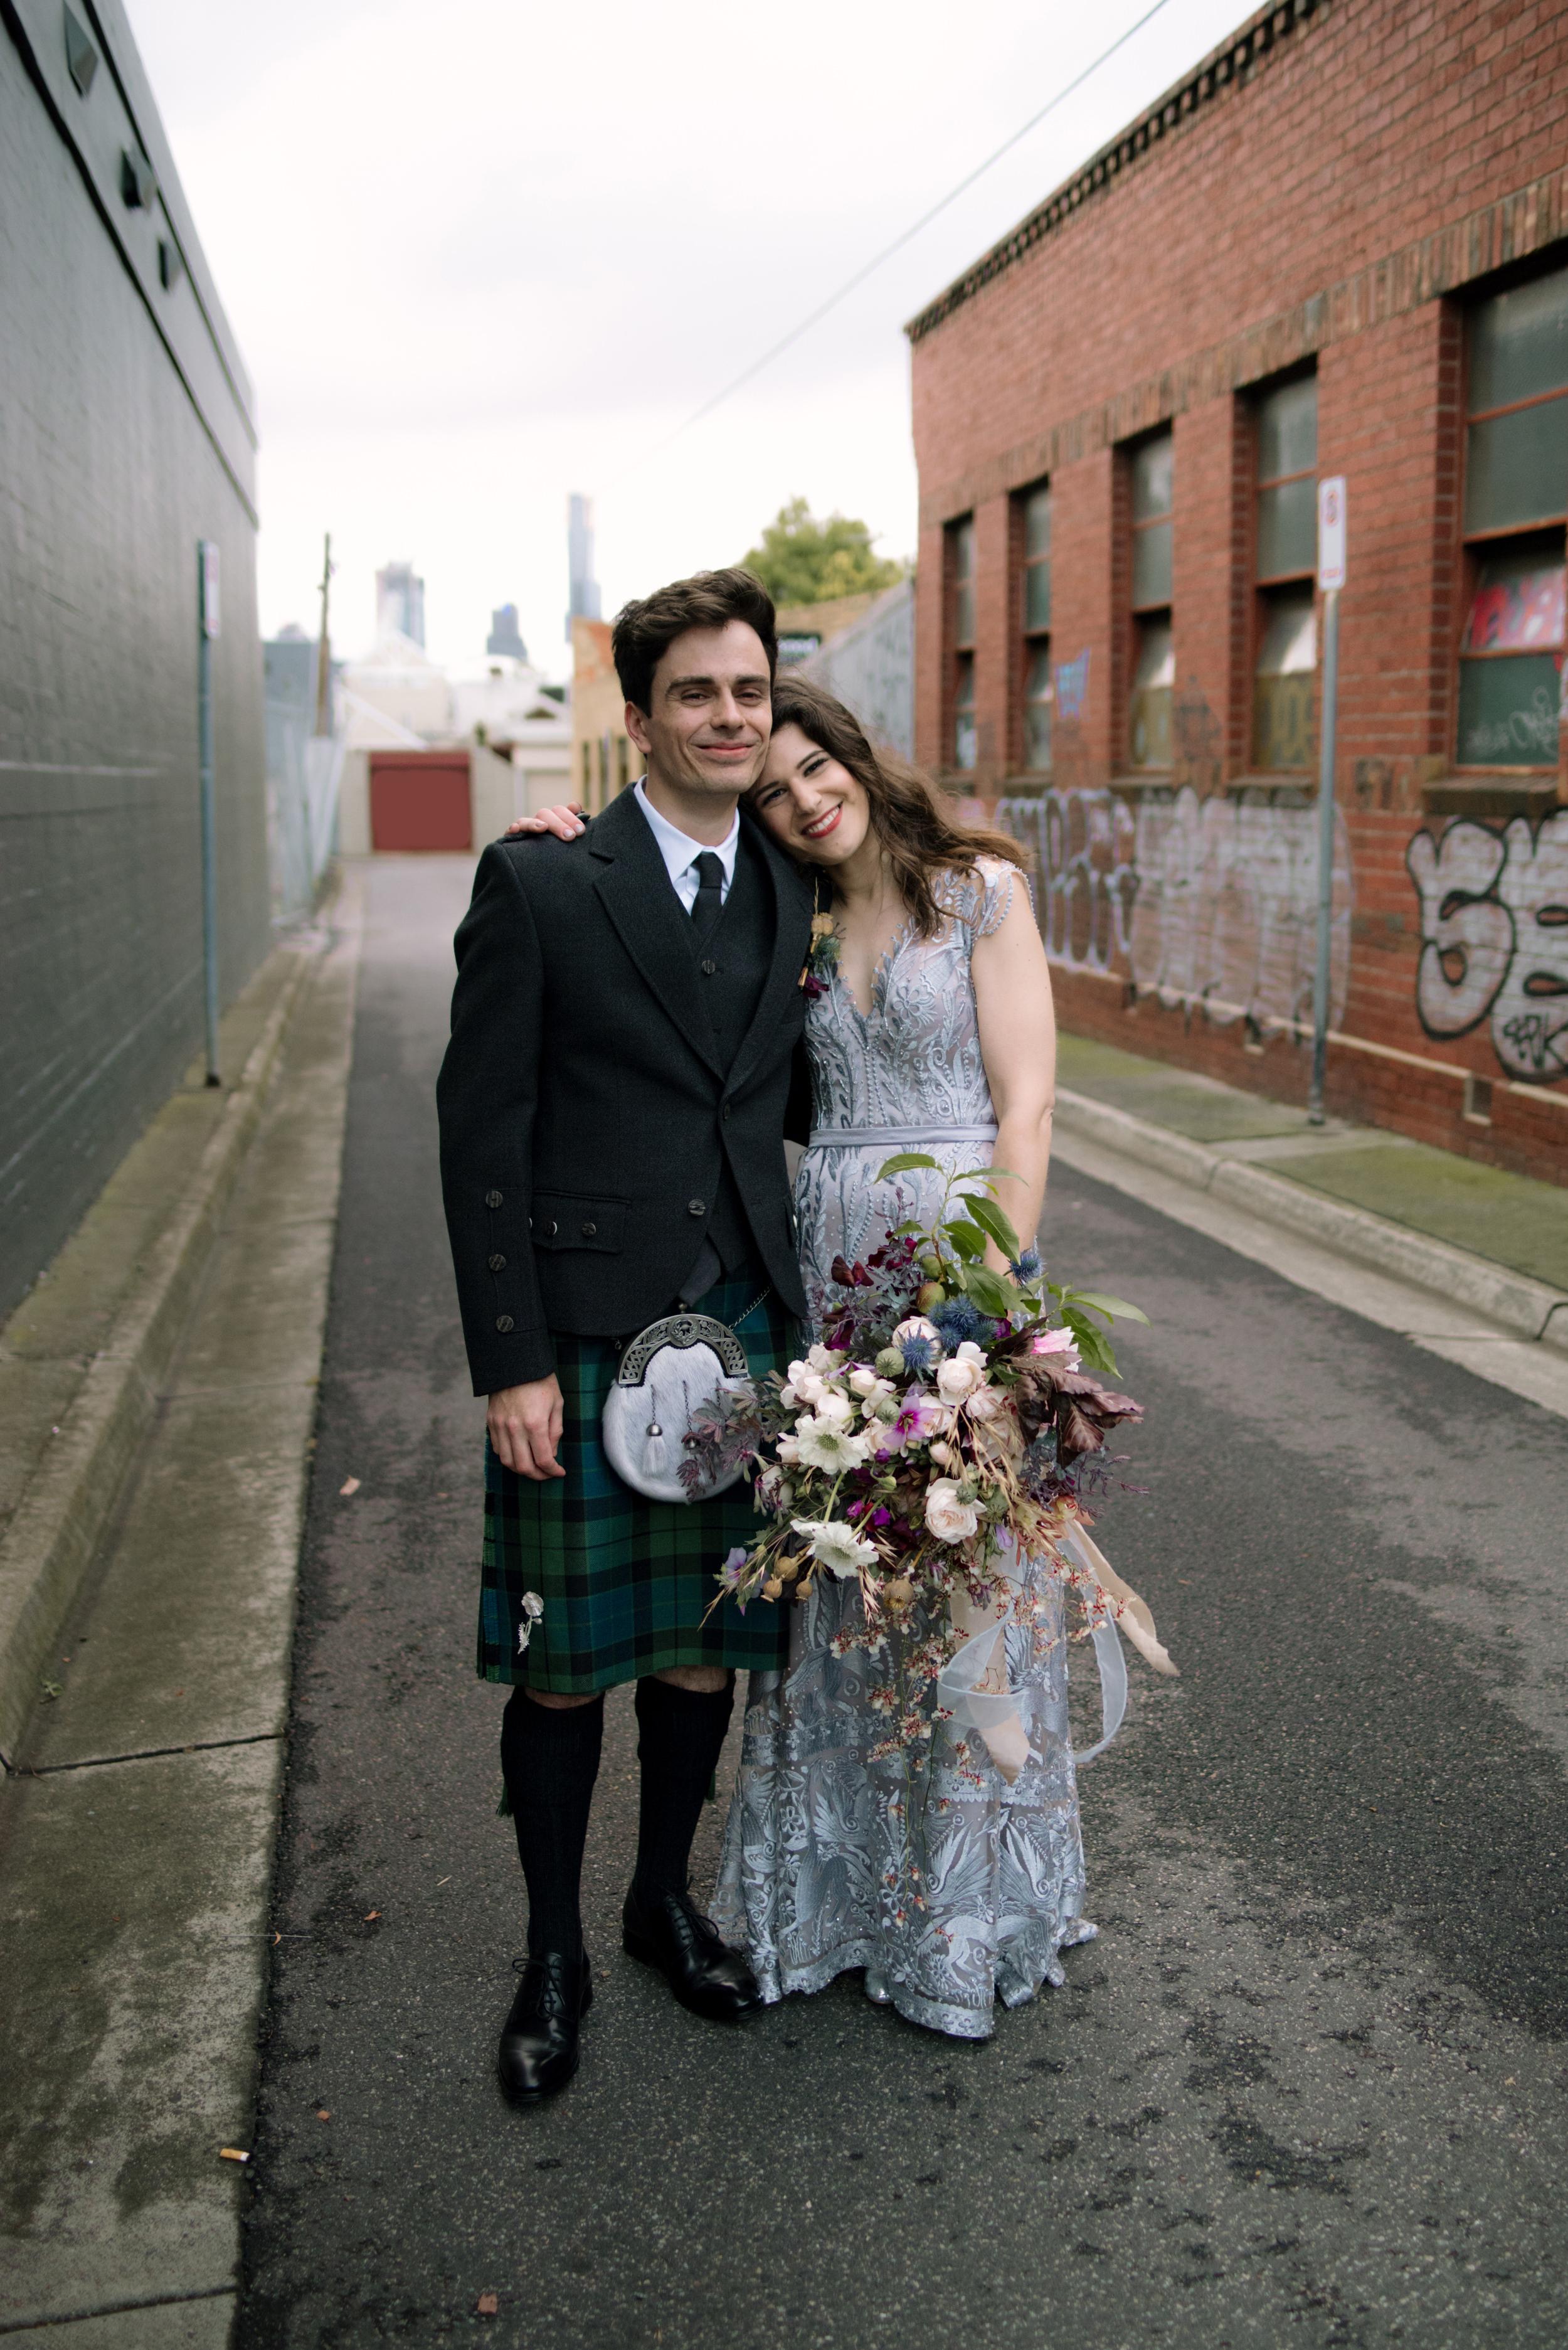 I-Got-You-Babe-&.Co.-Glasshaus-Wedding-Charlotte-Cameron0102.JPG